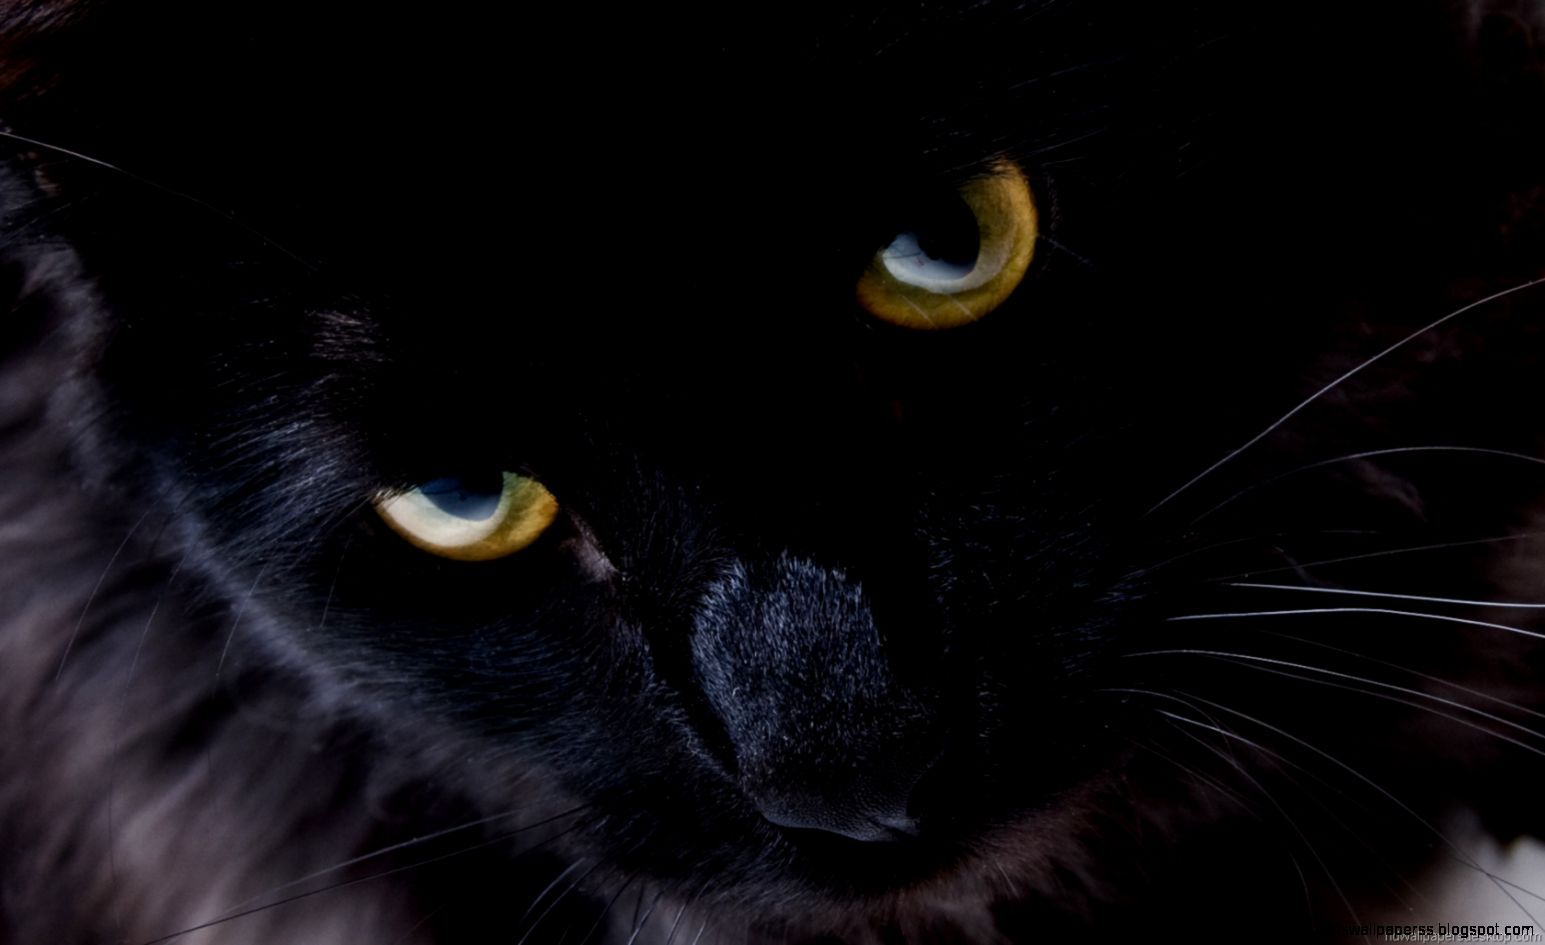 Black Cat Hd Wallpaper Widescreen   High Definitions ...